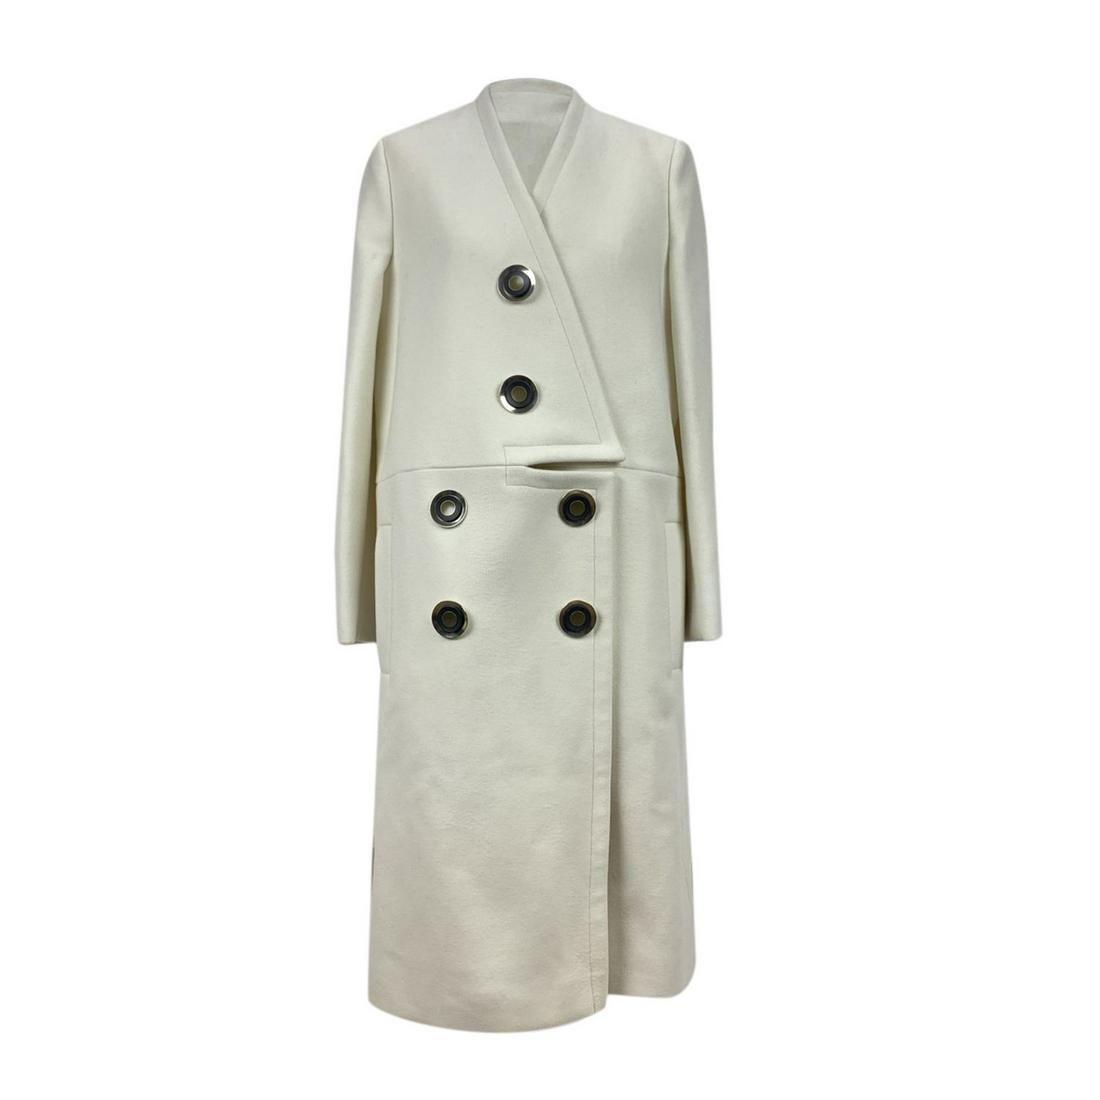 Stella McCartney White Wool Blend Susie Coat Size 40 IT